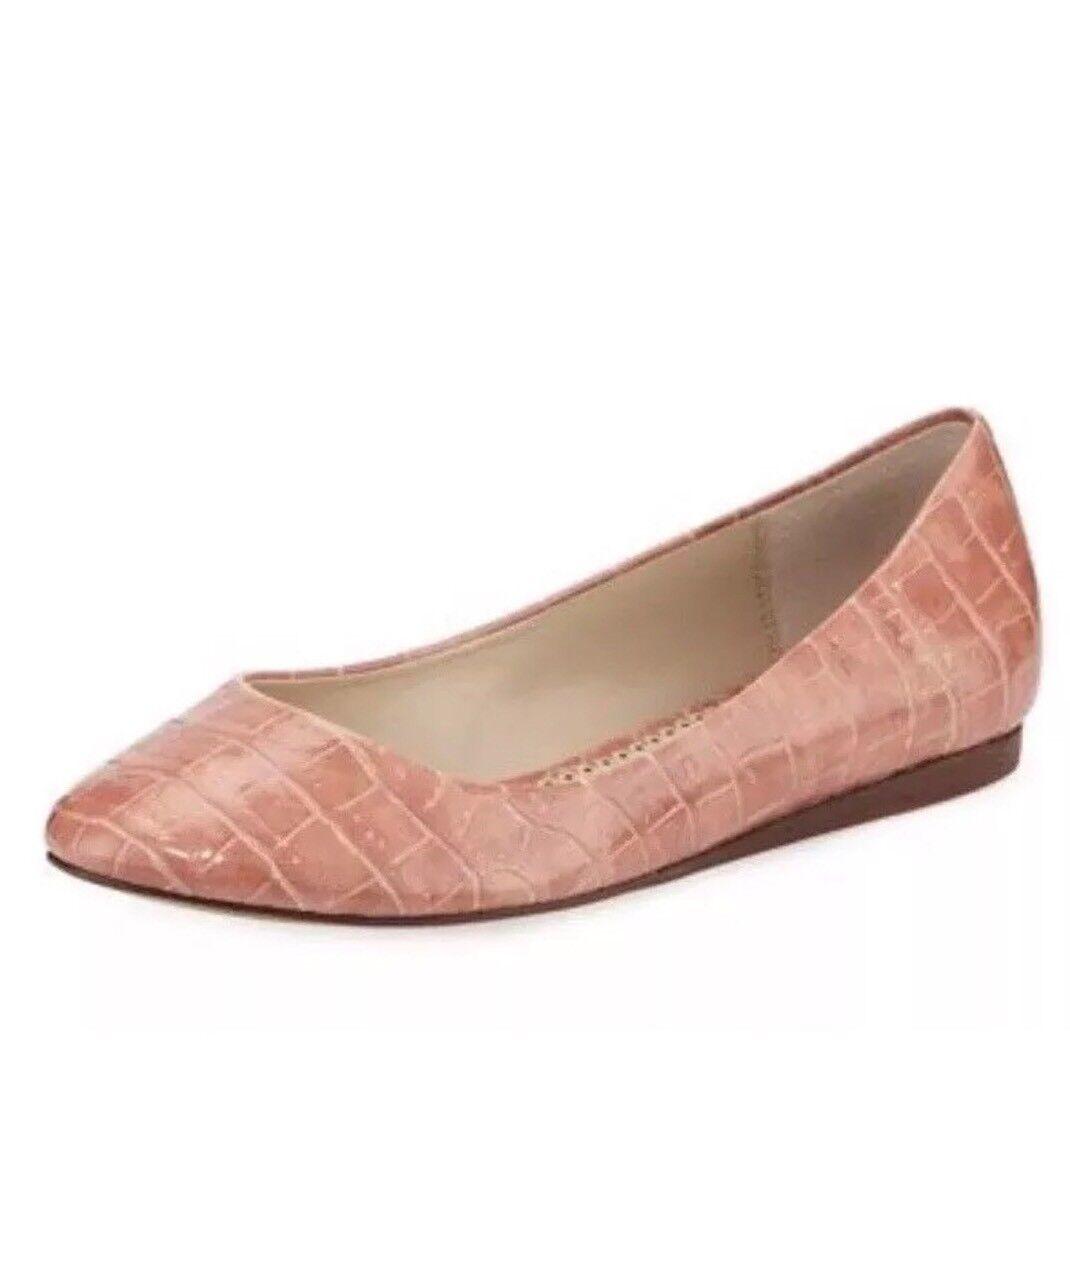 BN STELLA MCCARTNEY Ballerina Pumps shoes Size 5,5